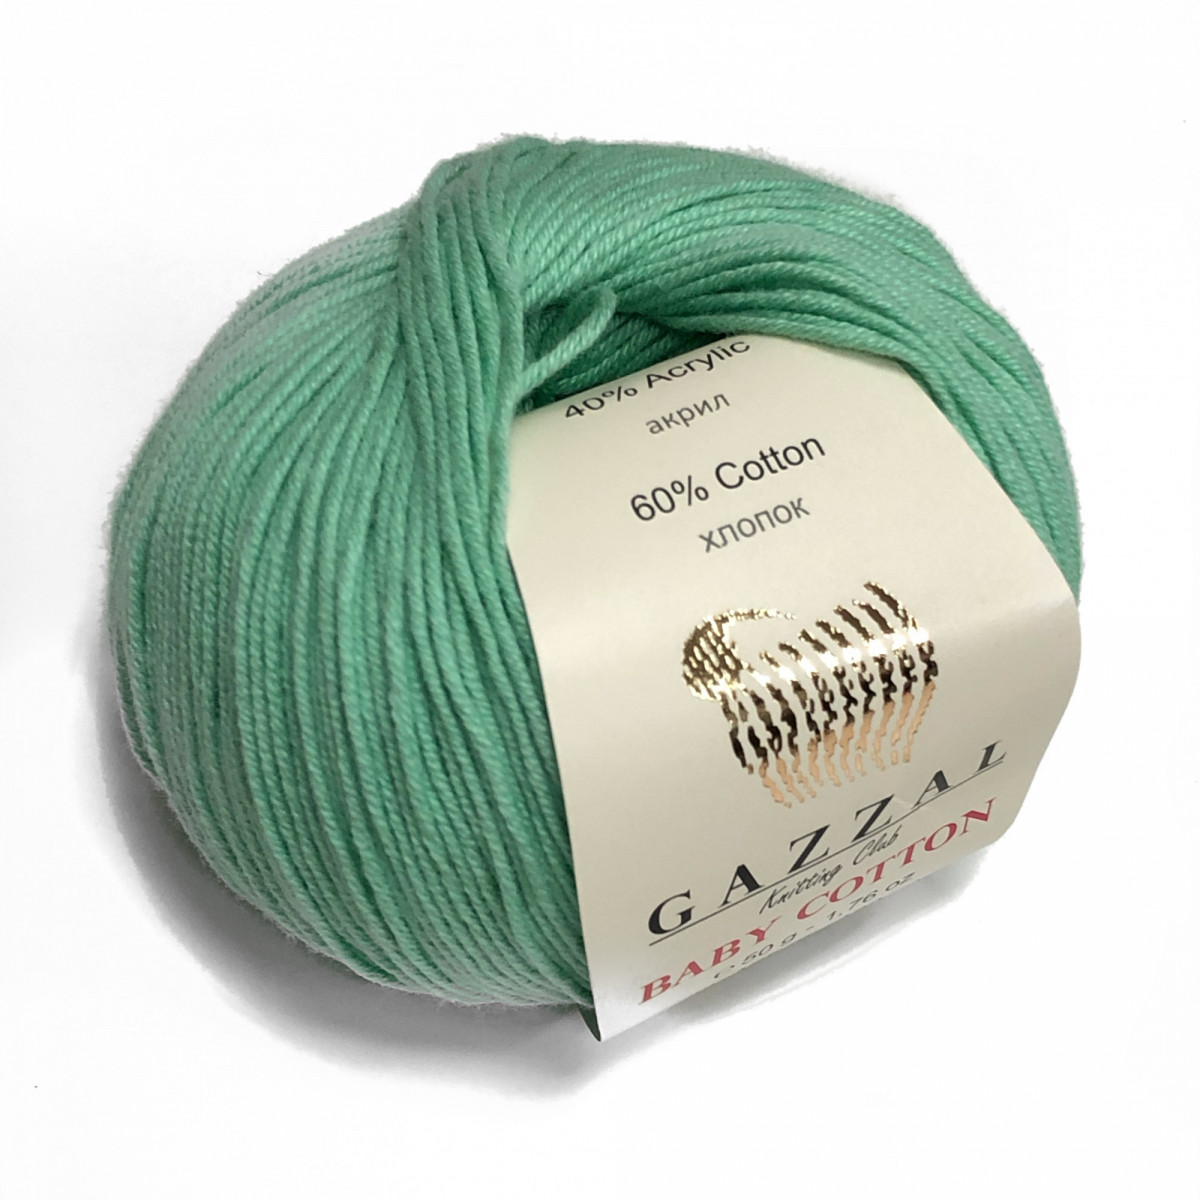 Пряжа Газзал Бэби Коттон (Baby cotton)